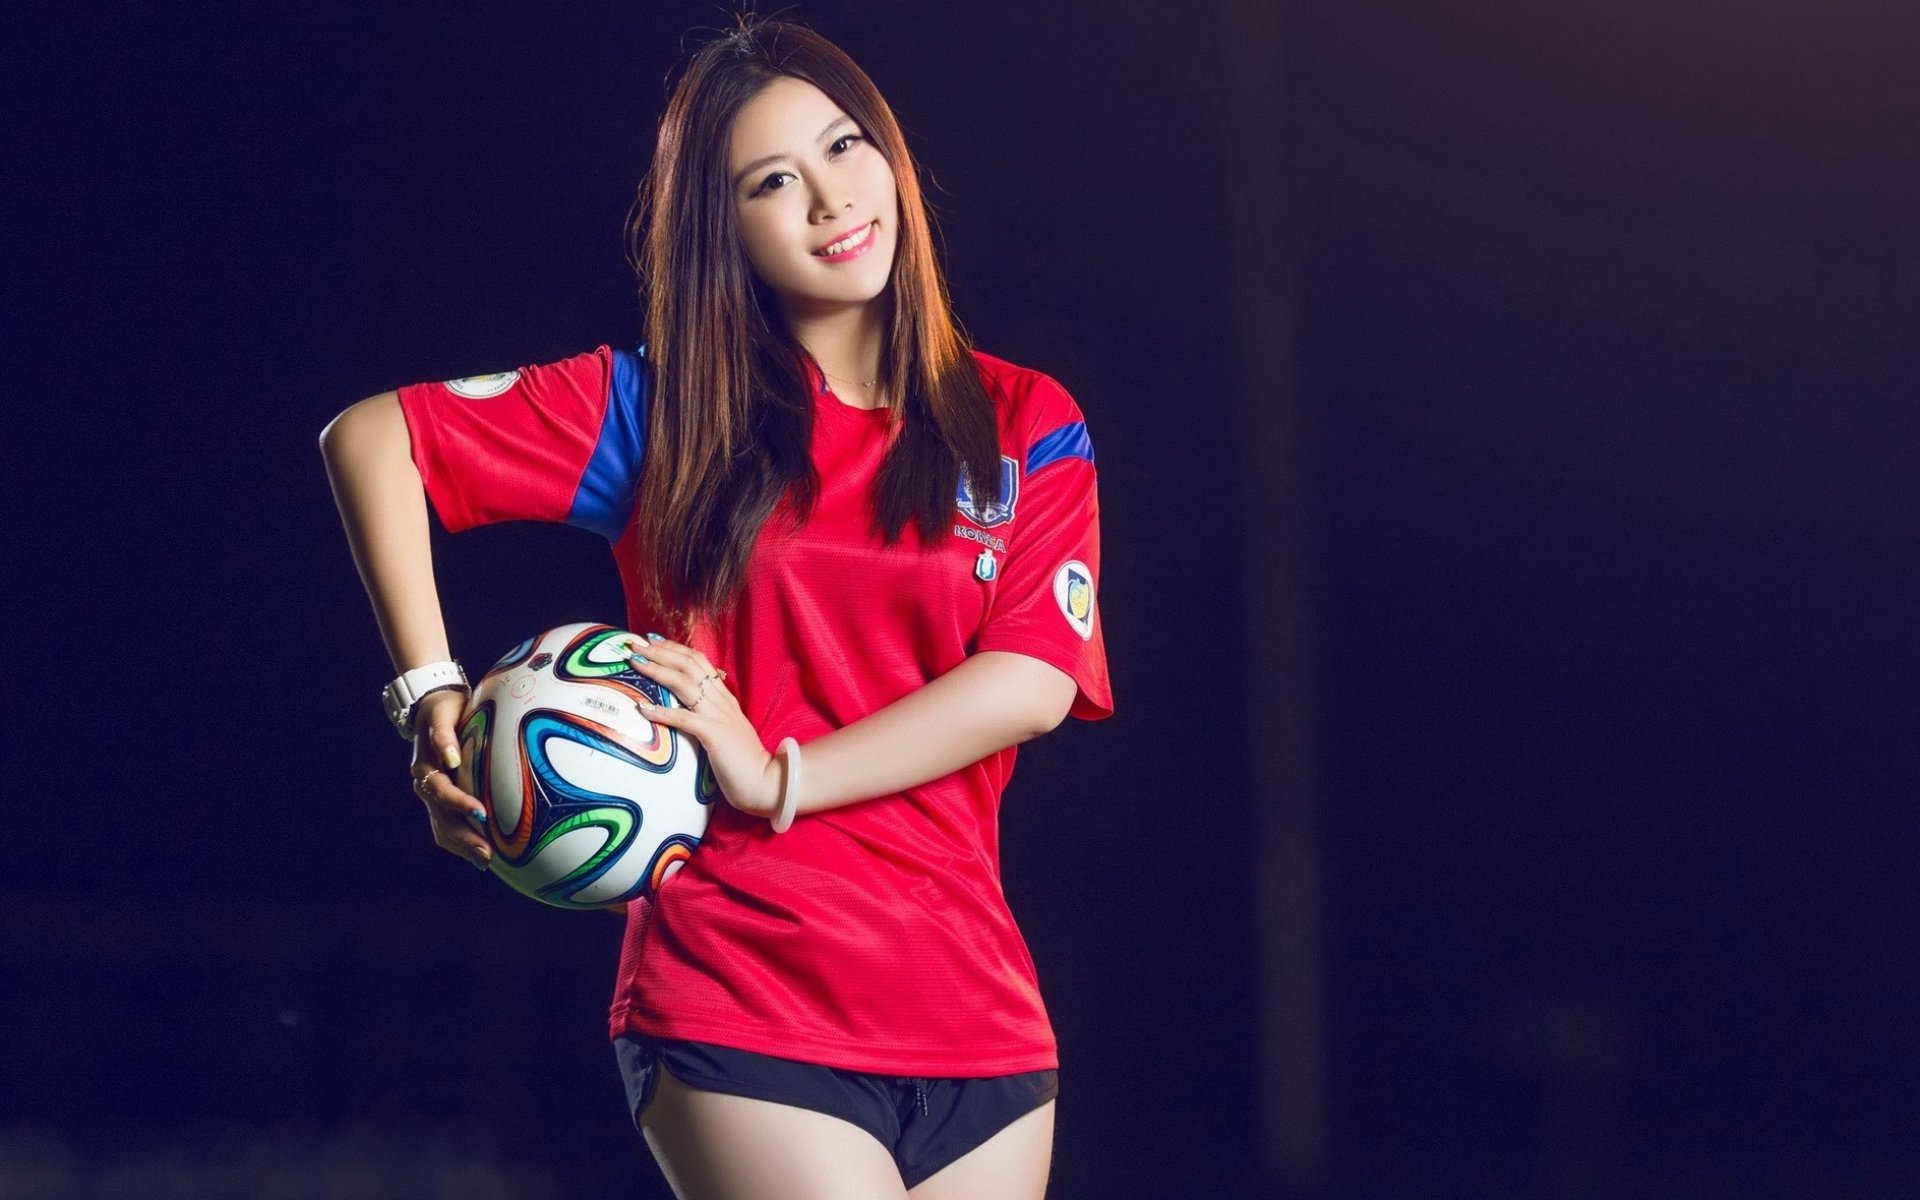 American Football Background Girl: Oriental Asian Girl Girls Woman Women Female Model Sports